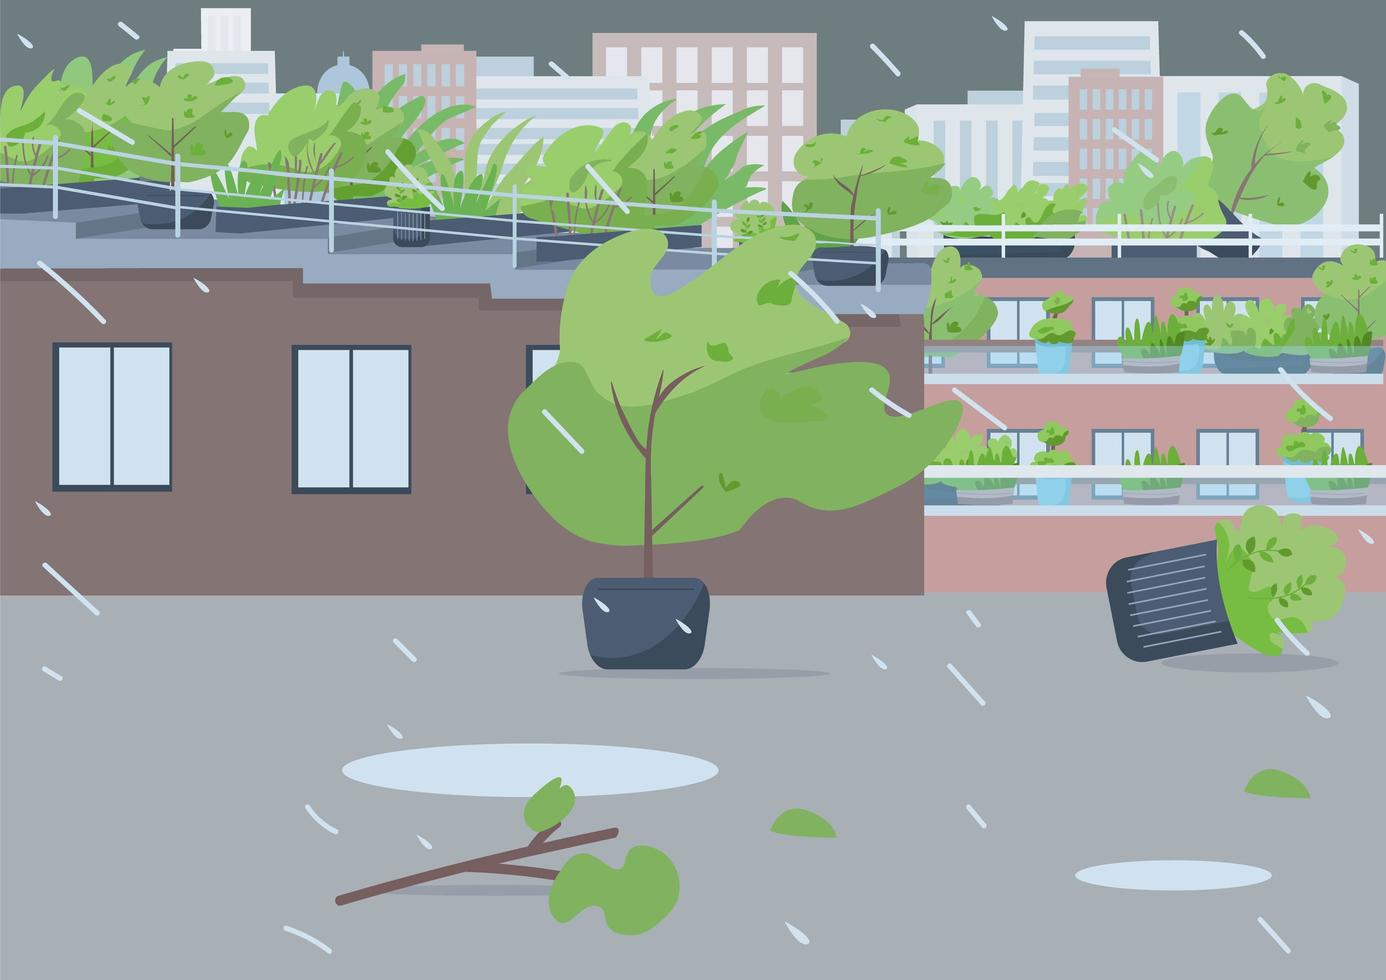 Regensturm auf leerer Straße vektor